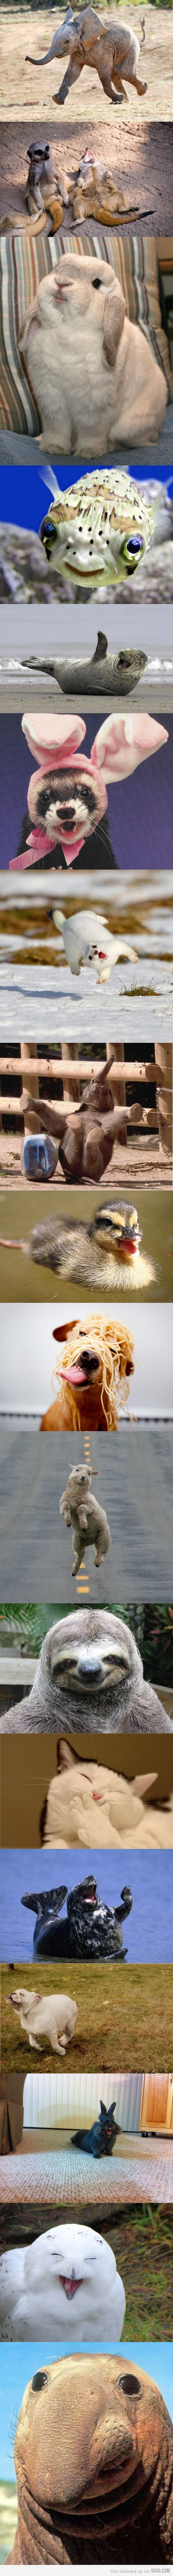 happiest animals ever!